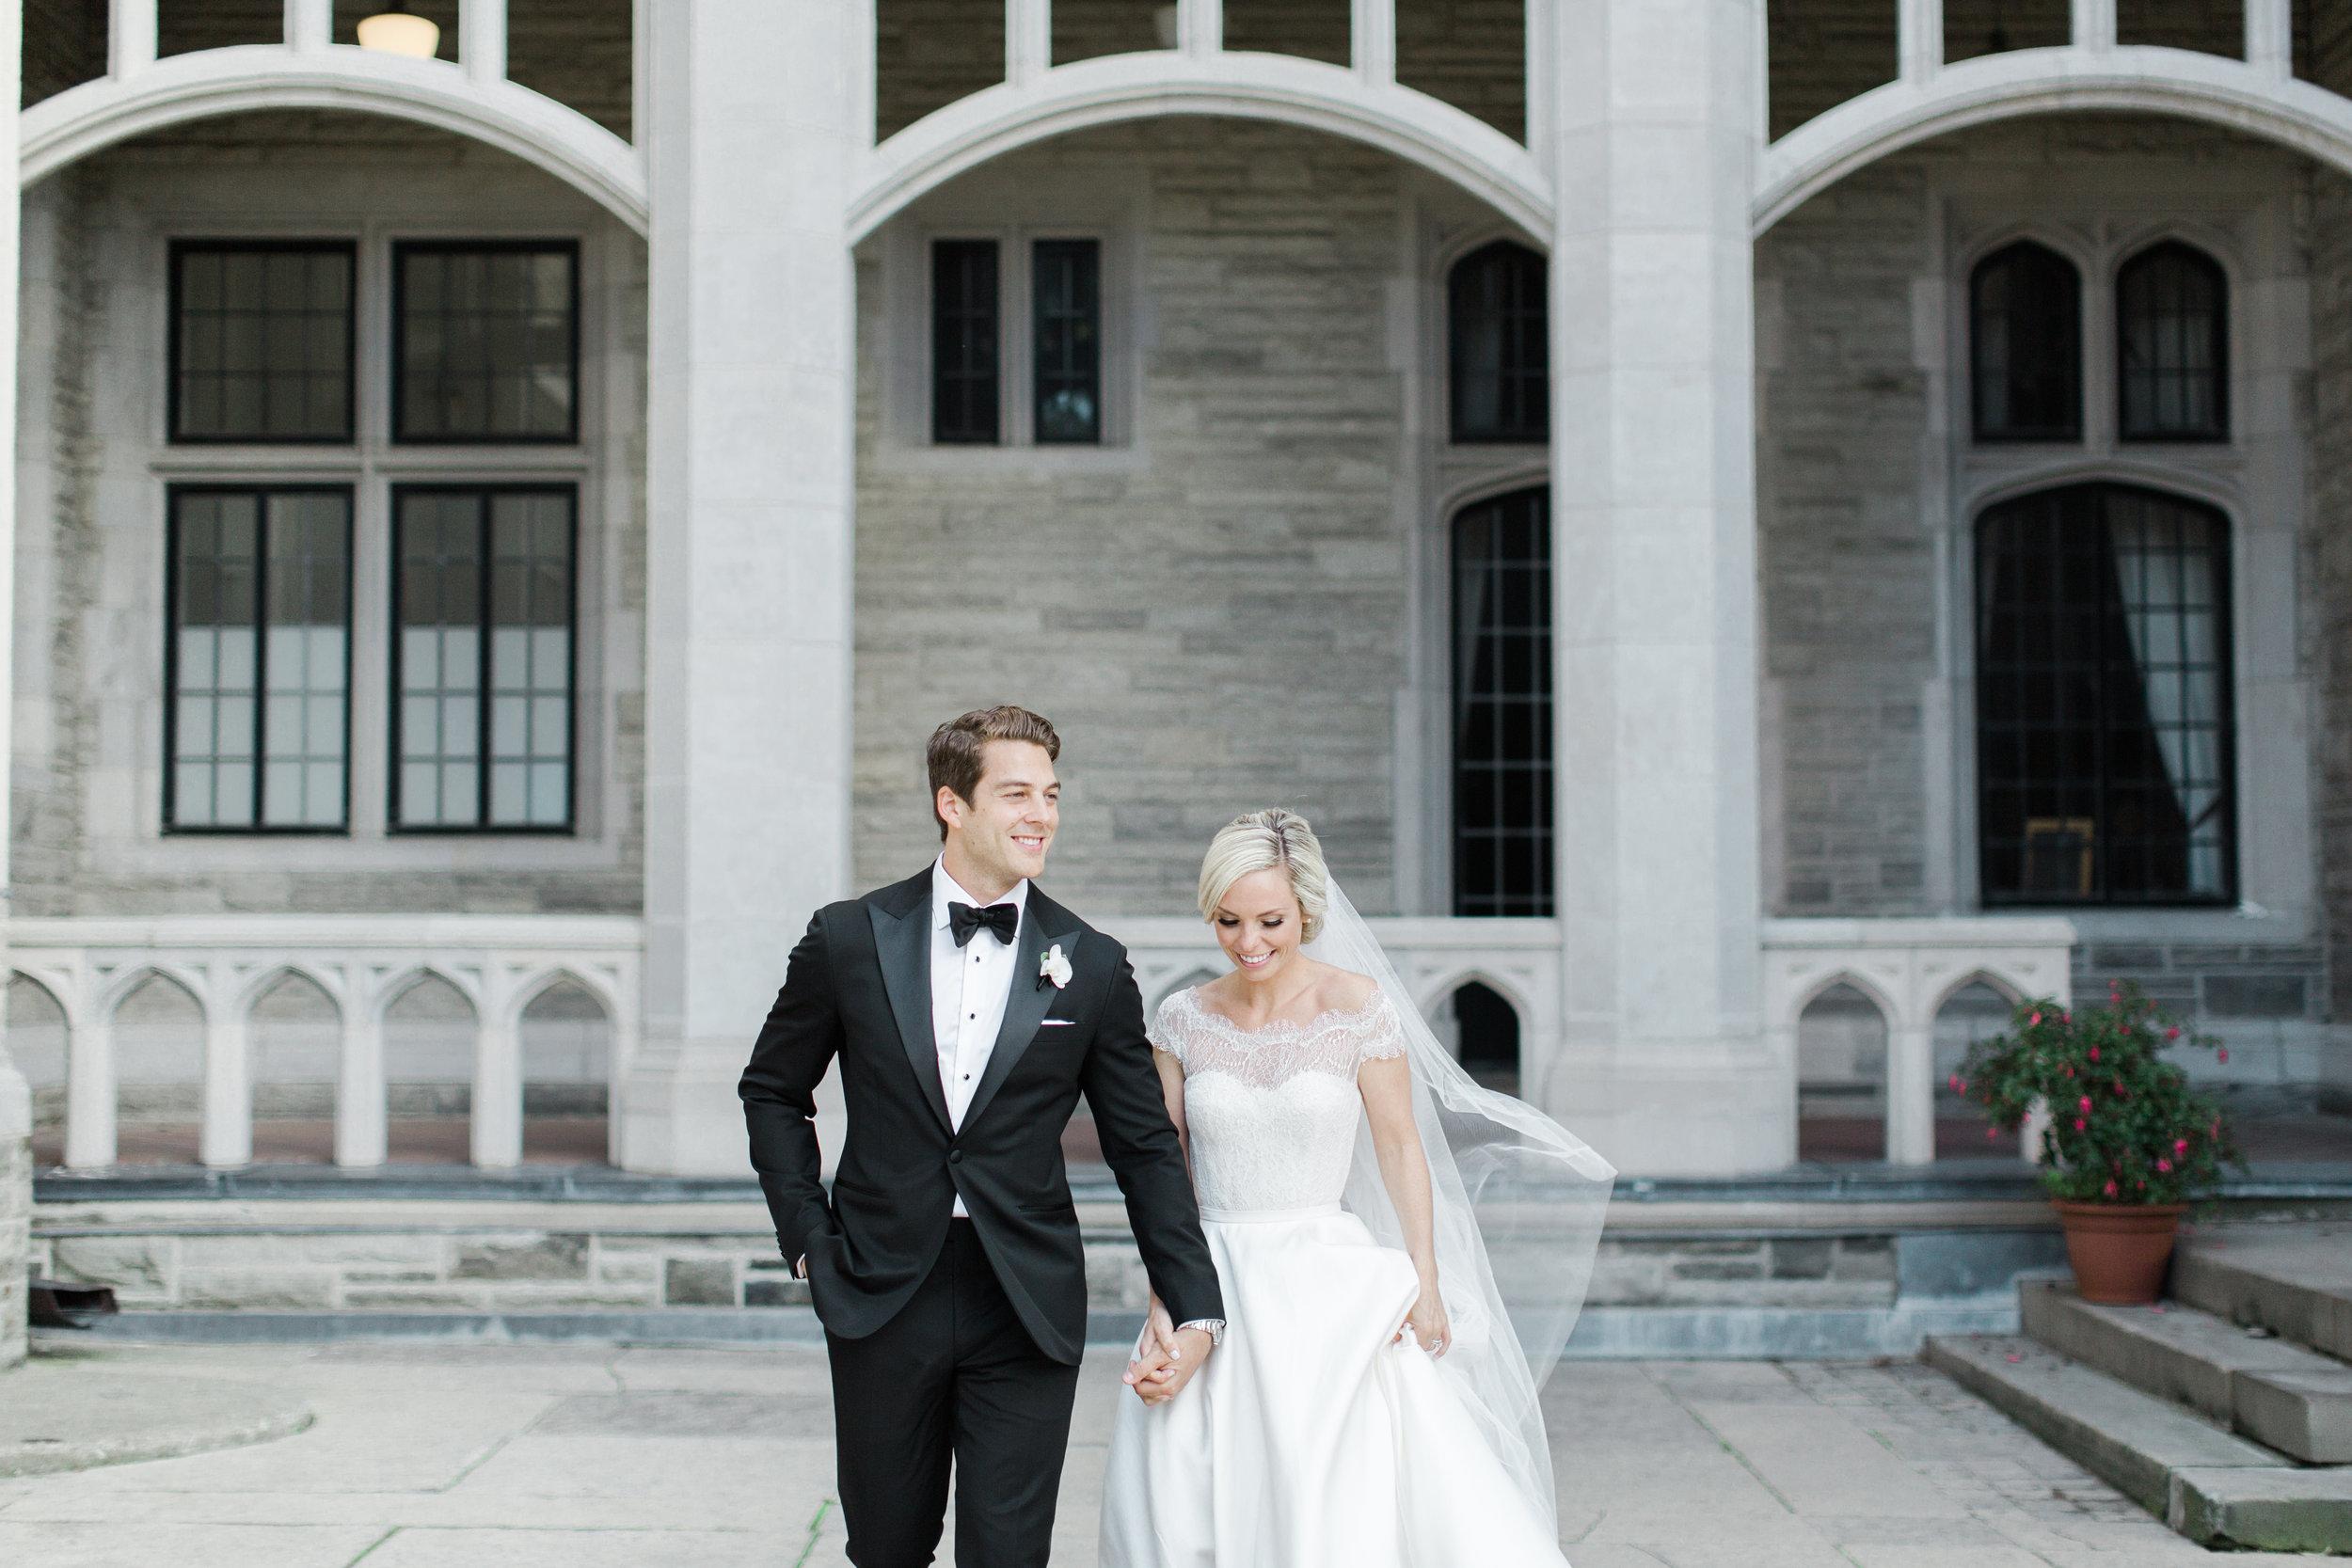 casa-loma-best-toronto-wedding-photographer-soft-bright-pastel-richelle-hunter-aynsley-richie-755.jpg